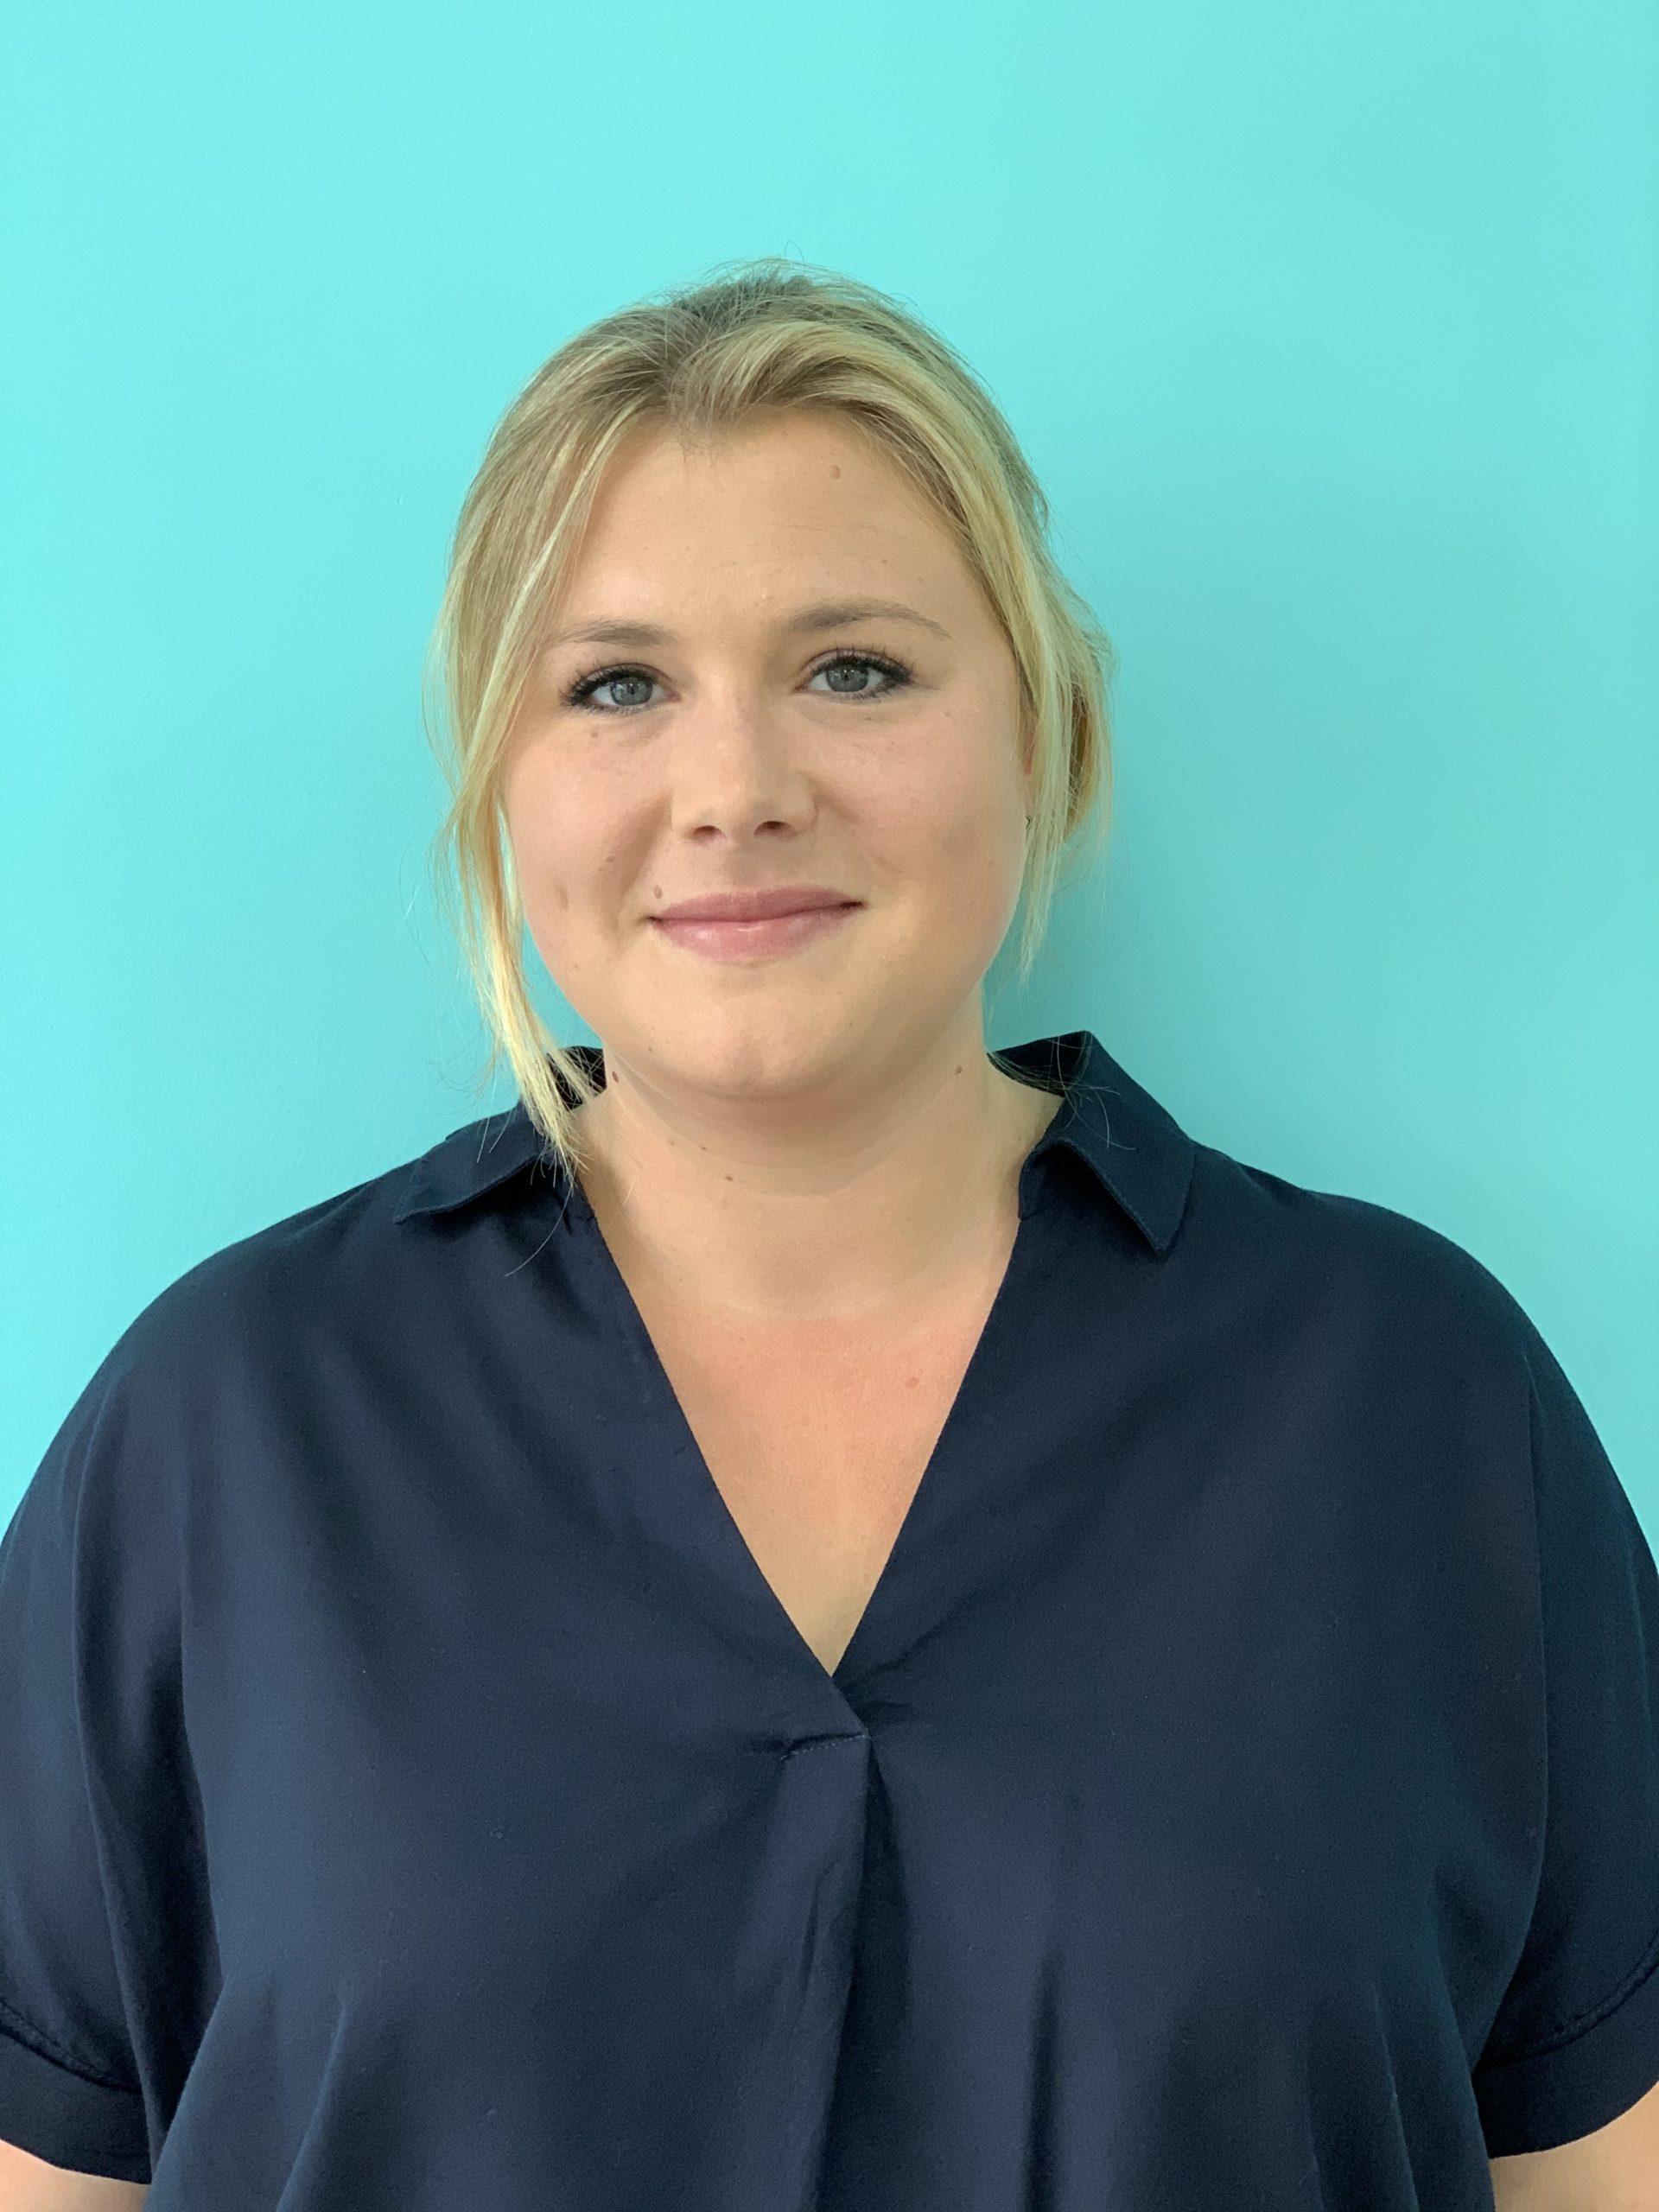 Michelle Houttekiet kine Gullegem